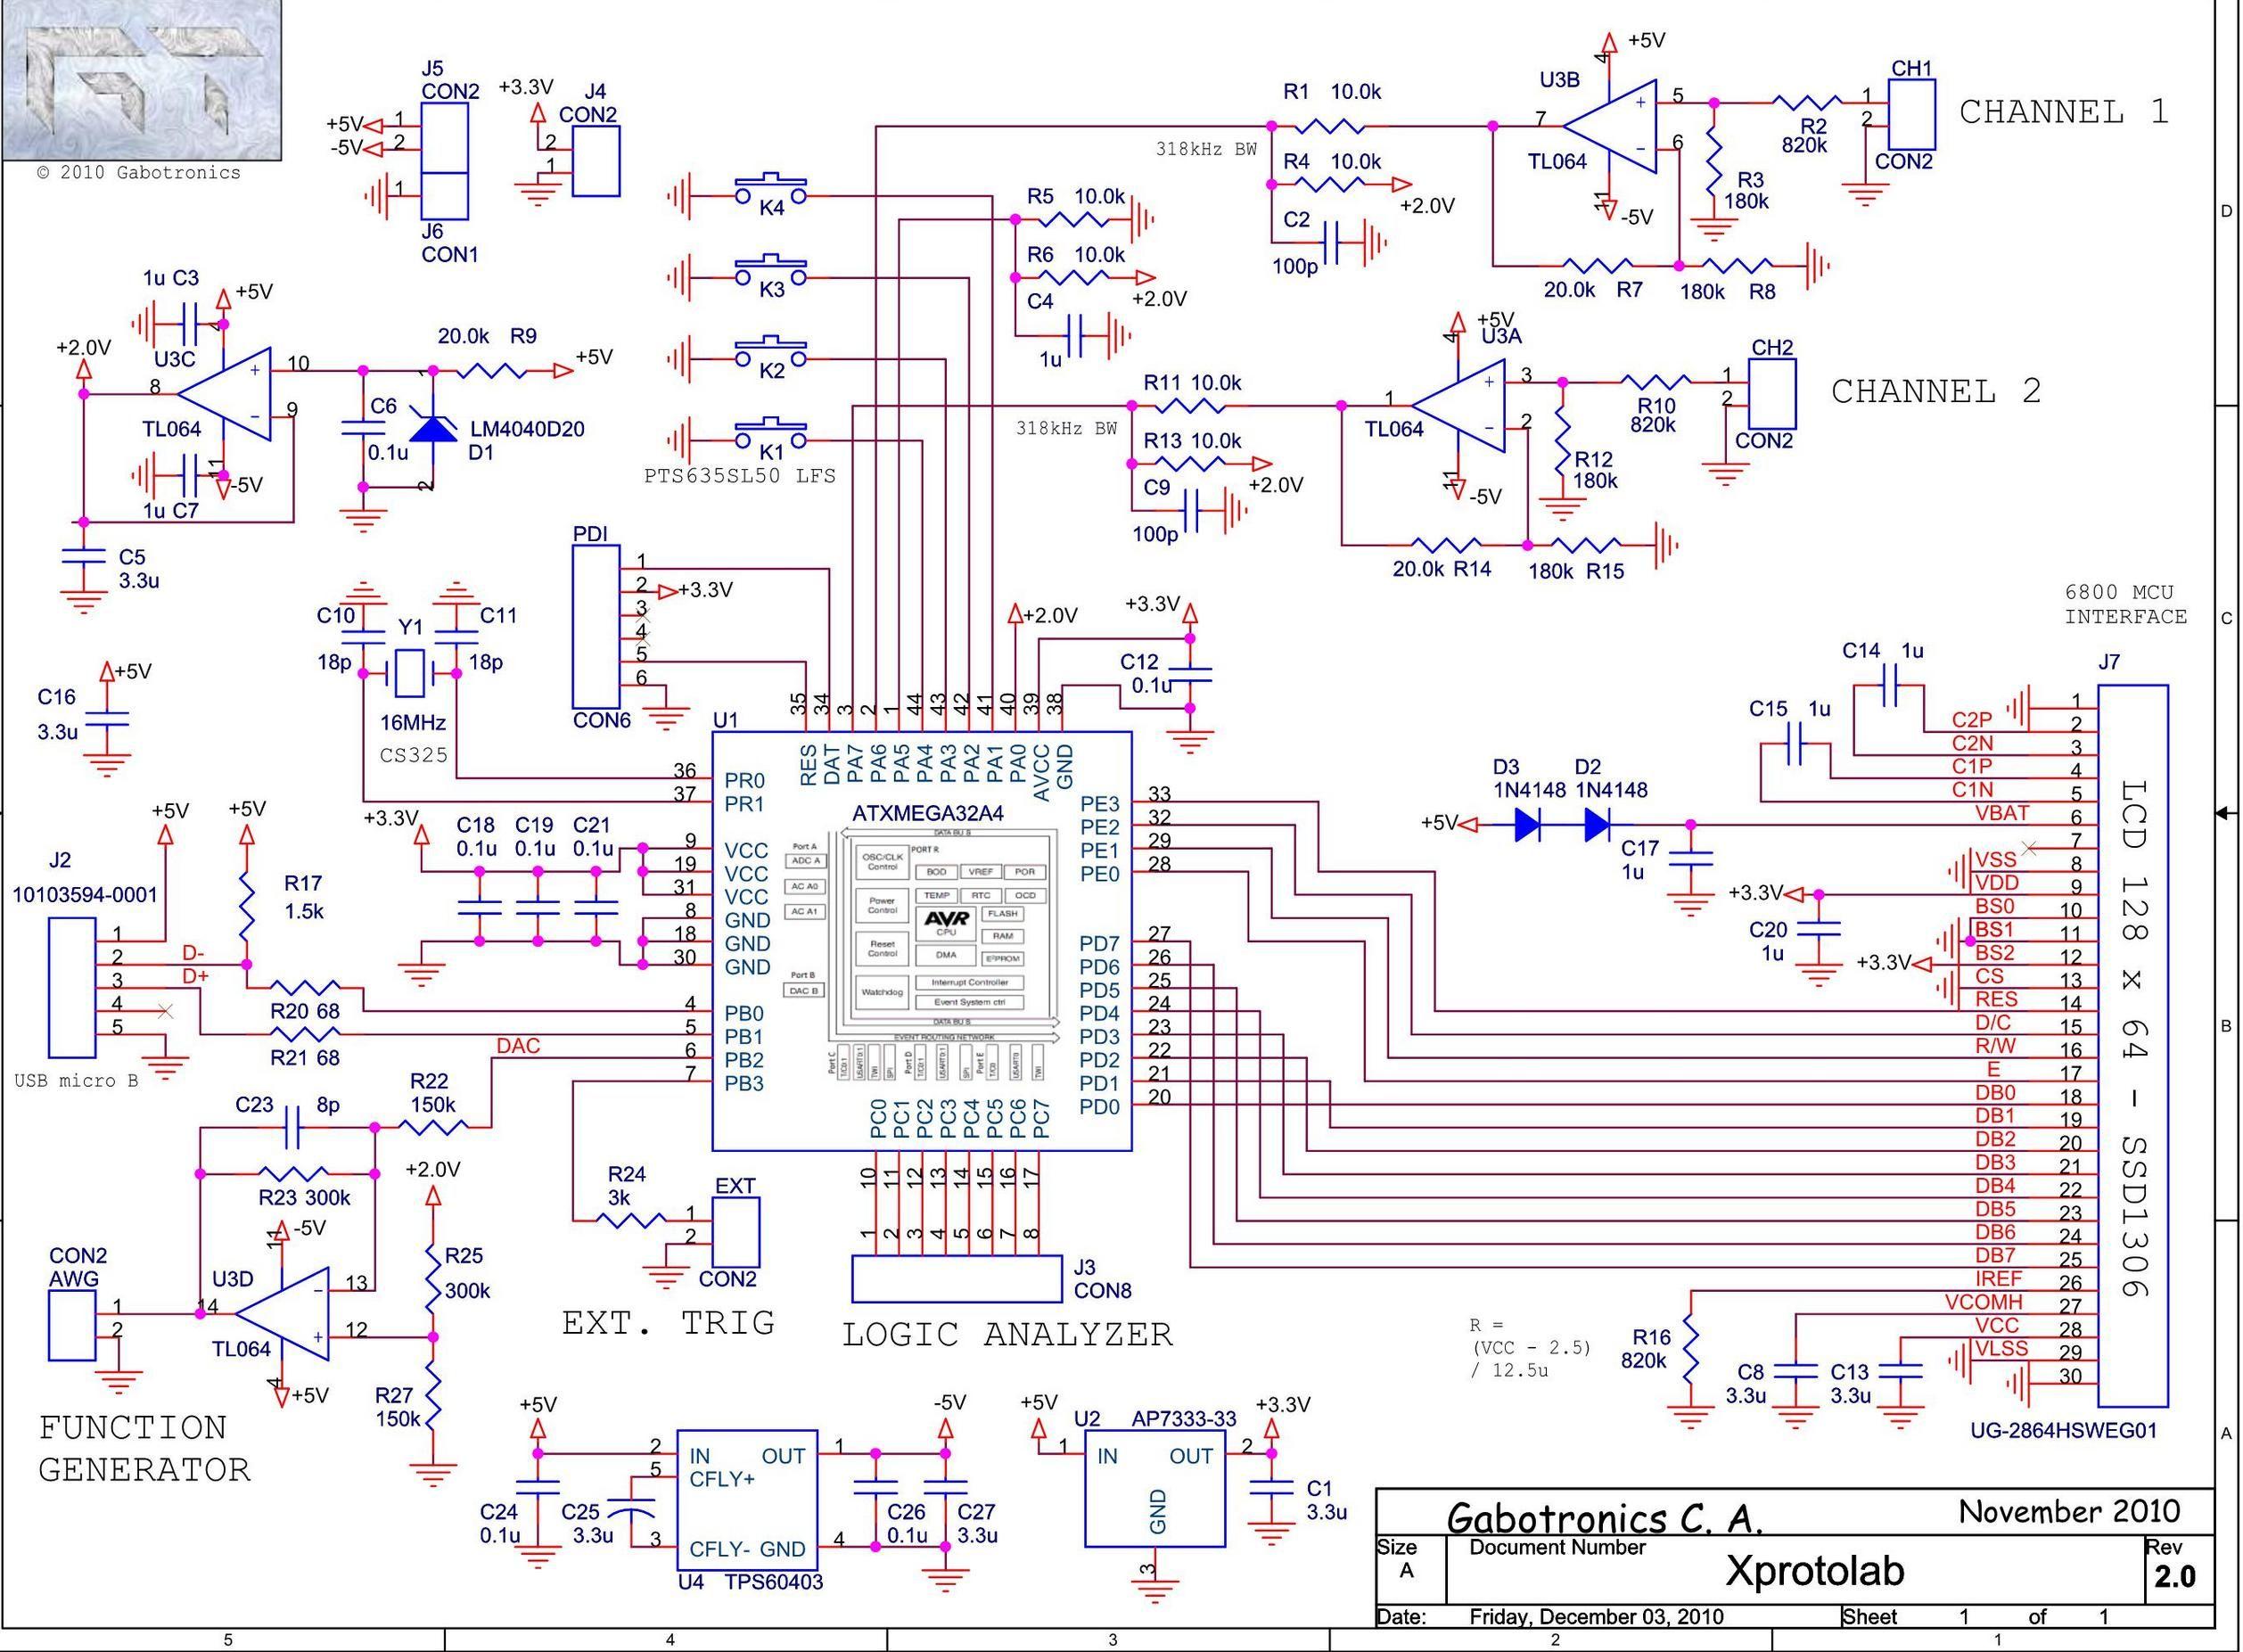 Schematic Diagram: mixed signal oscilloscope Xprotolab on ATXMEGA32 | tech•ie | Electronics